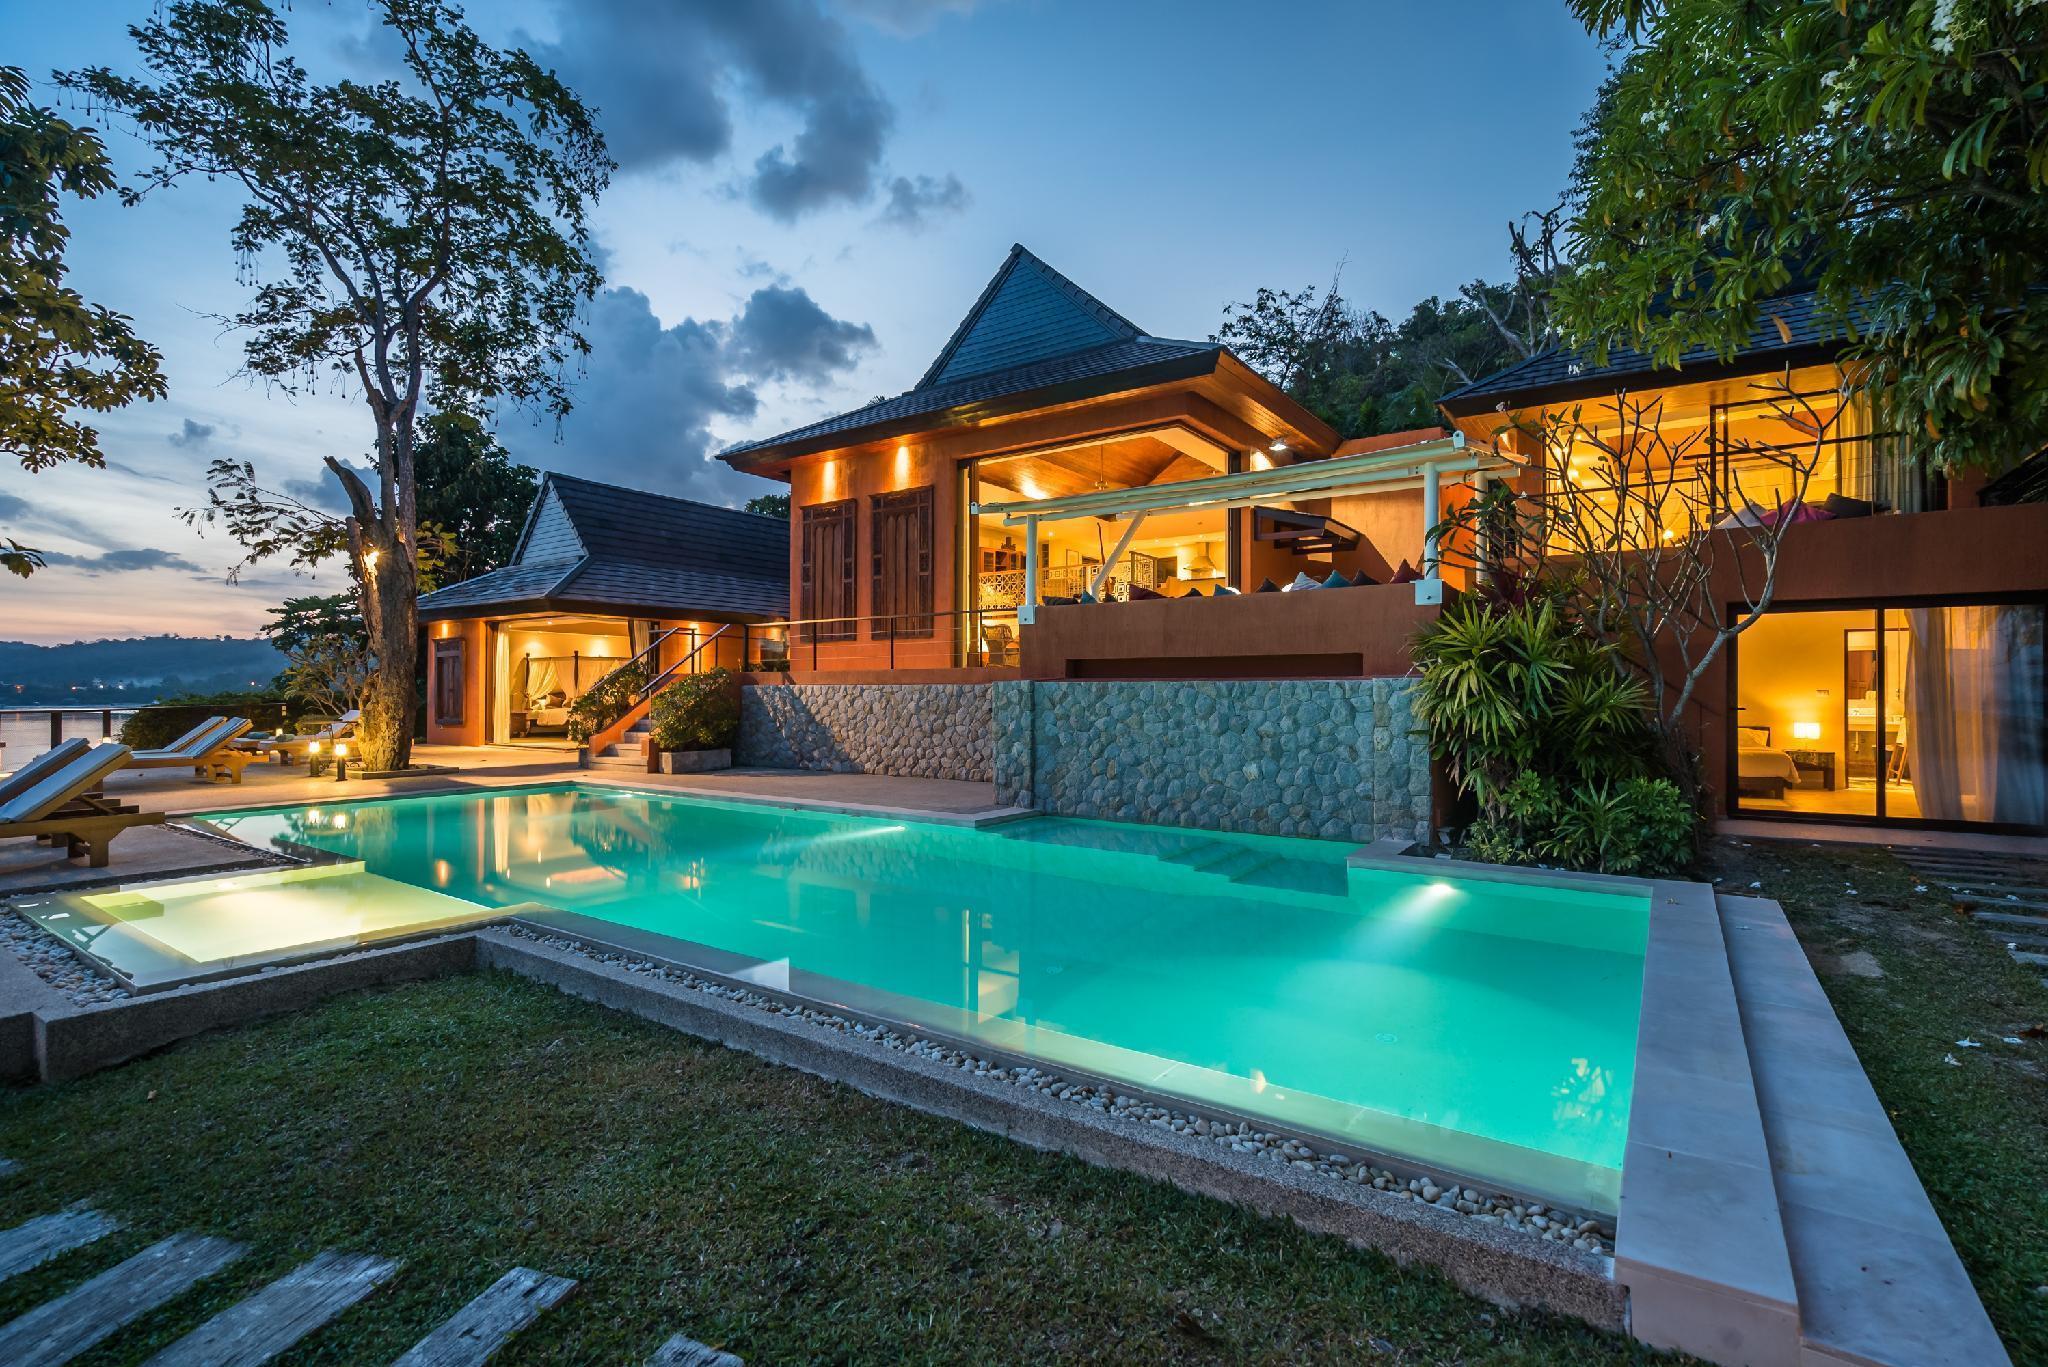 Villa Nam Bo - Oceanfront with maid and chef วิลลา 5 ห้องนอน 5 ห้องน้ำส่วนตัว ขนาด 600 ตร.ม. – แหลมพันวา